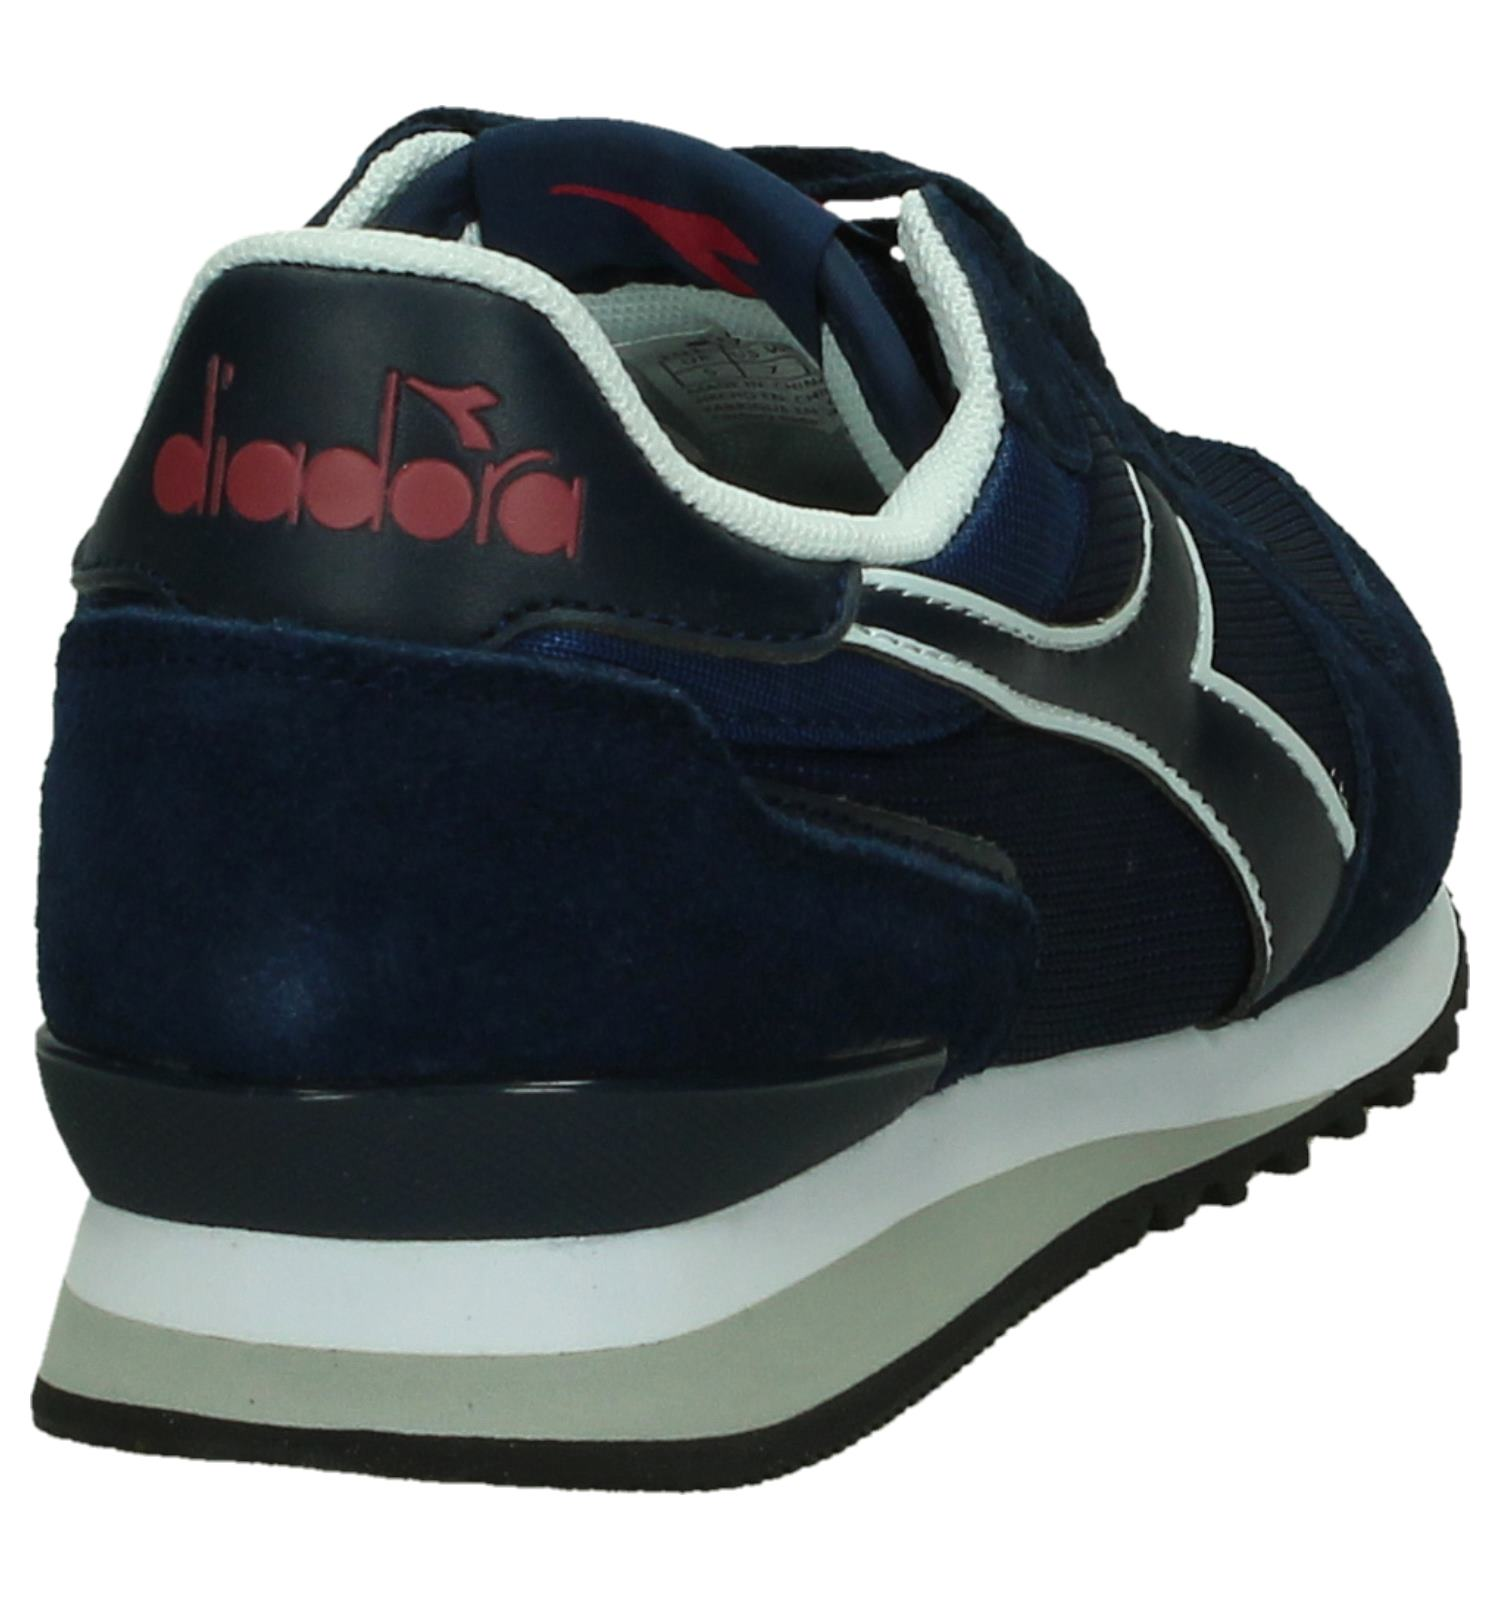 Sneaker Sneaker Sneaker Diadora Diadora Diadora Donkerblauw Donkerblauw XOZiuPk